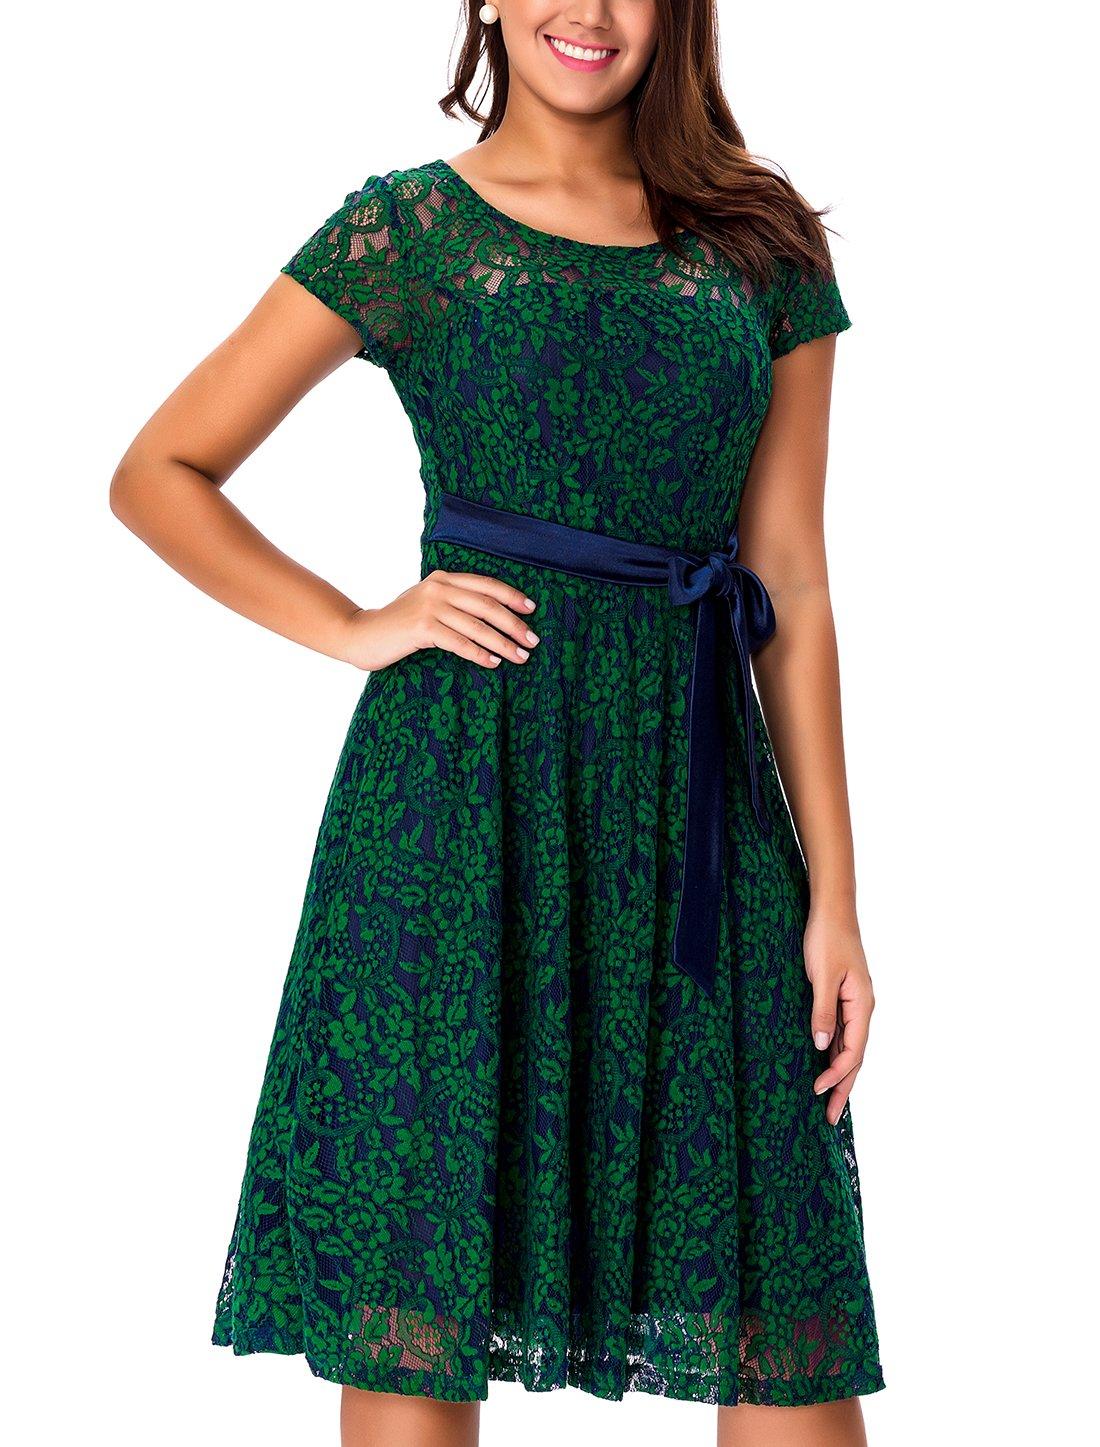 Noctflos Women Vintage Lace Short Sleeves Swing Garden Party Dress Emerald Green